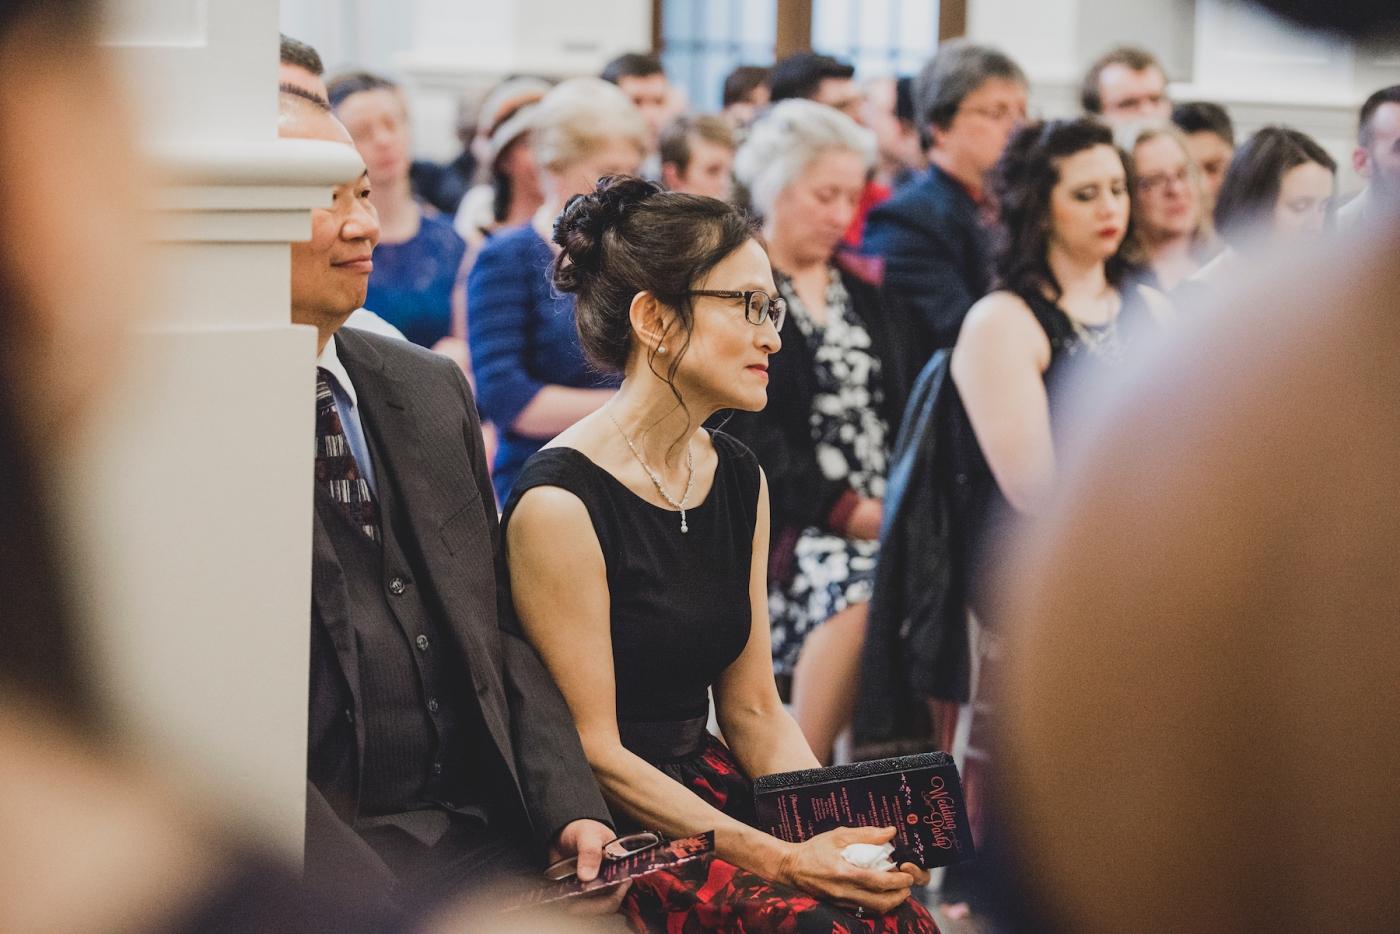 DSC_2643Everett_Wedding_Ballroom_Jane_Speleers_photography_Rachel_and_Edmund_Ceremony_2017